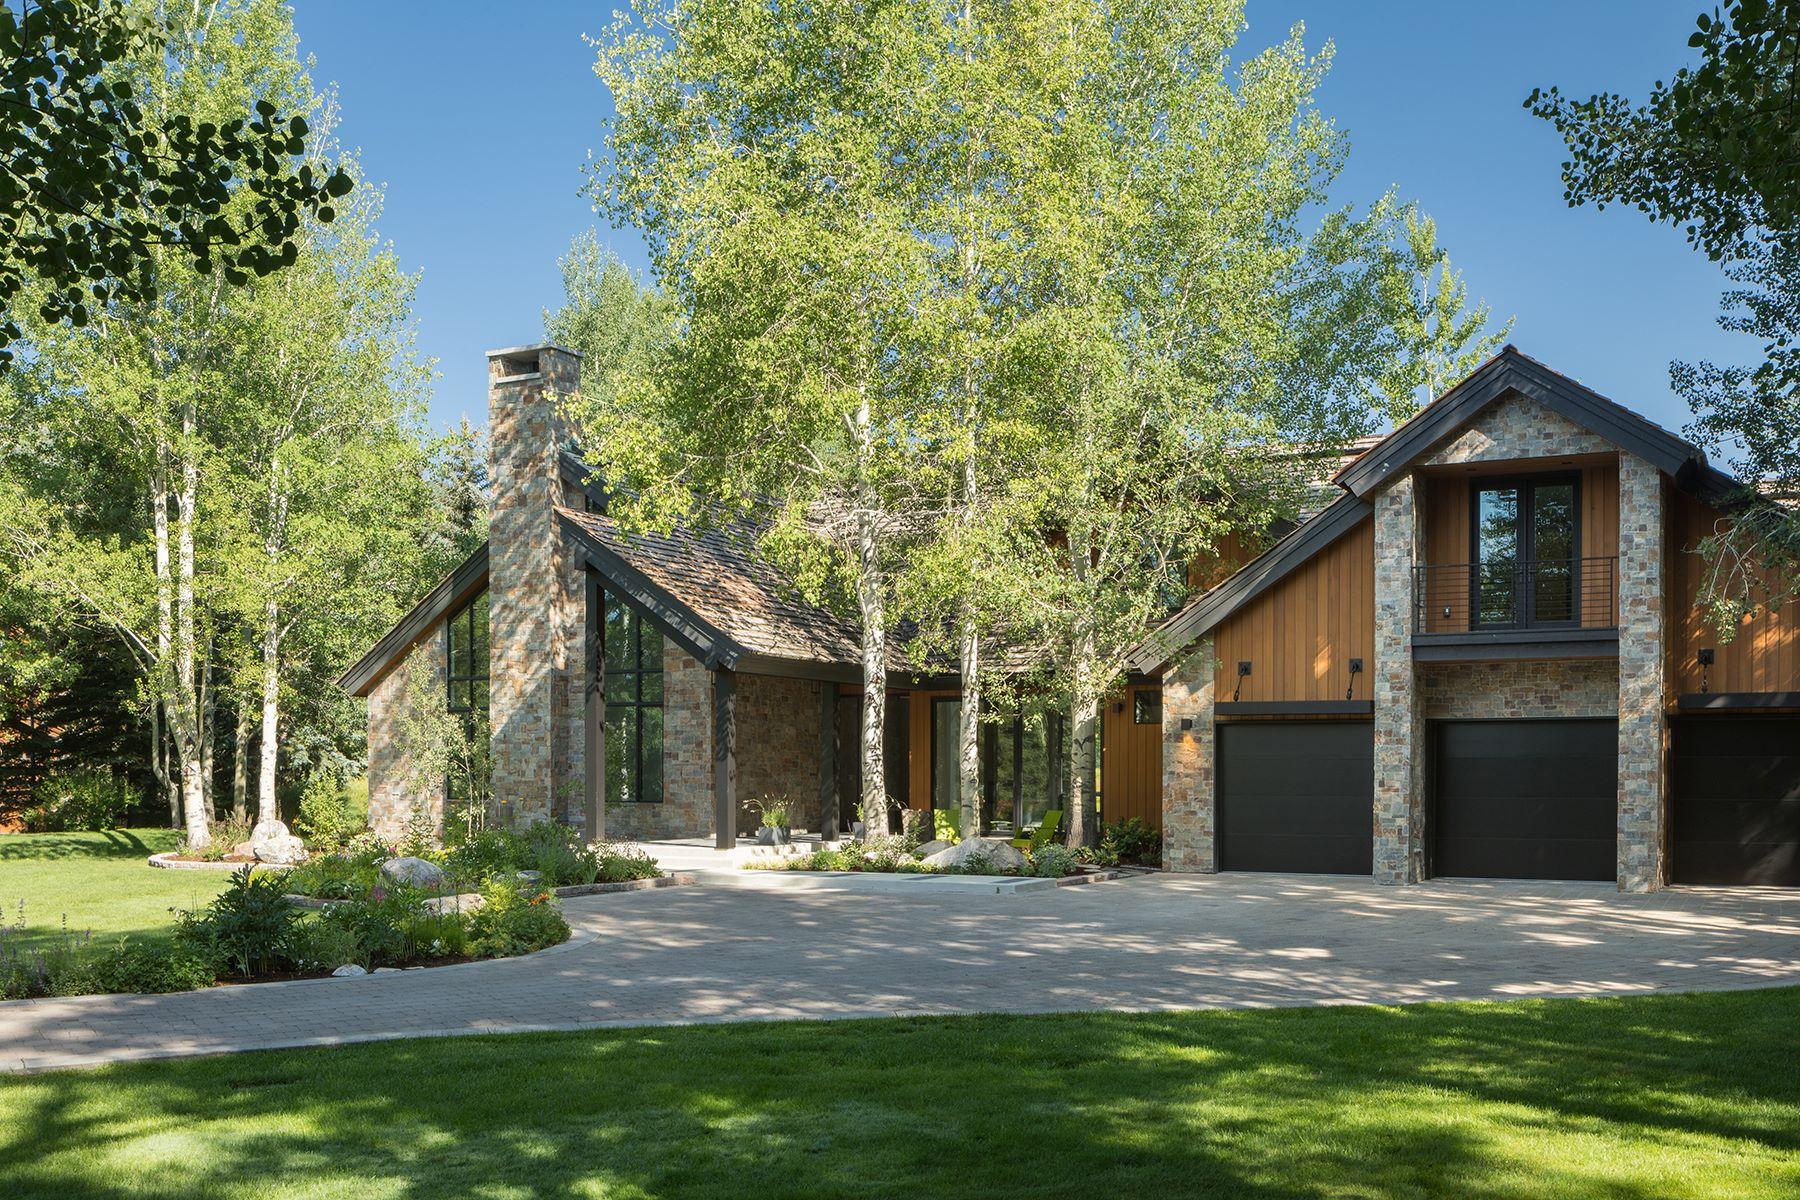 Single Family Homes pour l Vente à 2580 N Teton Pines Drive Wilson, Wyoming 83014 États-Unis